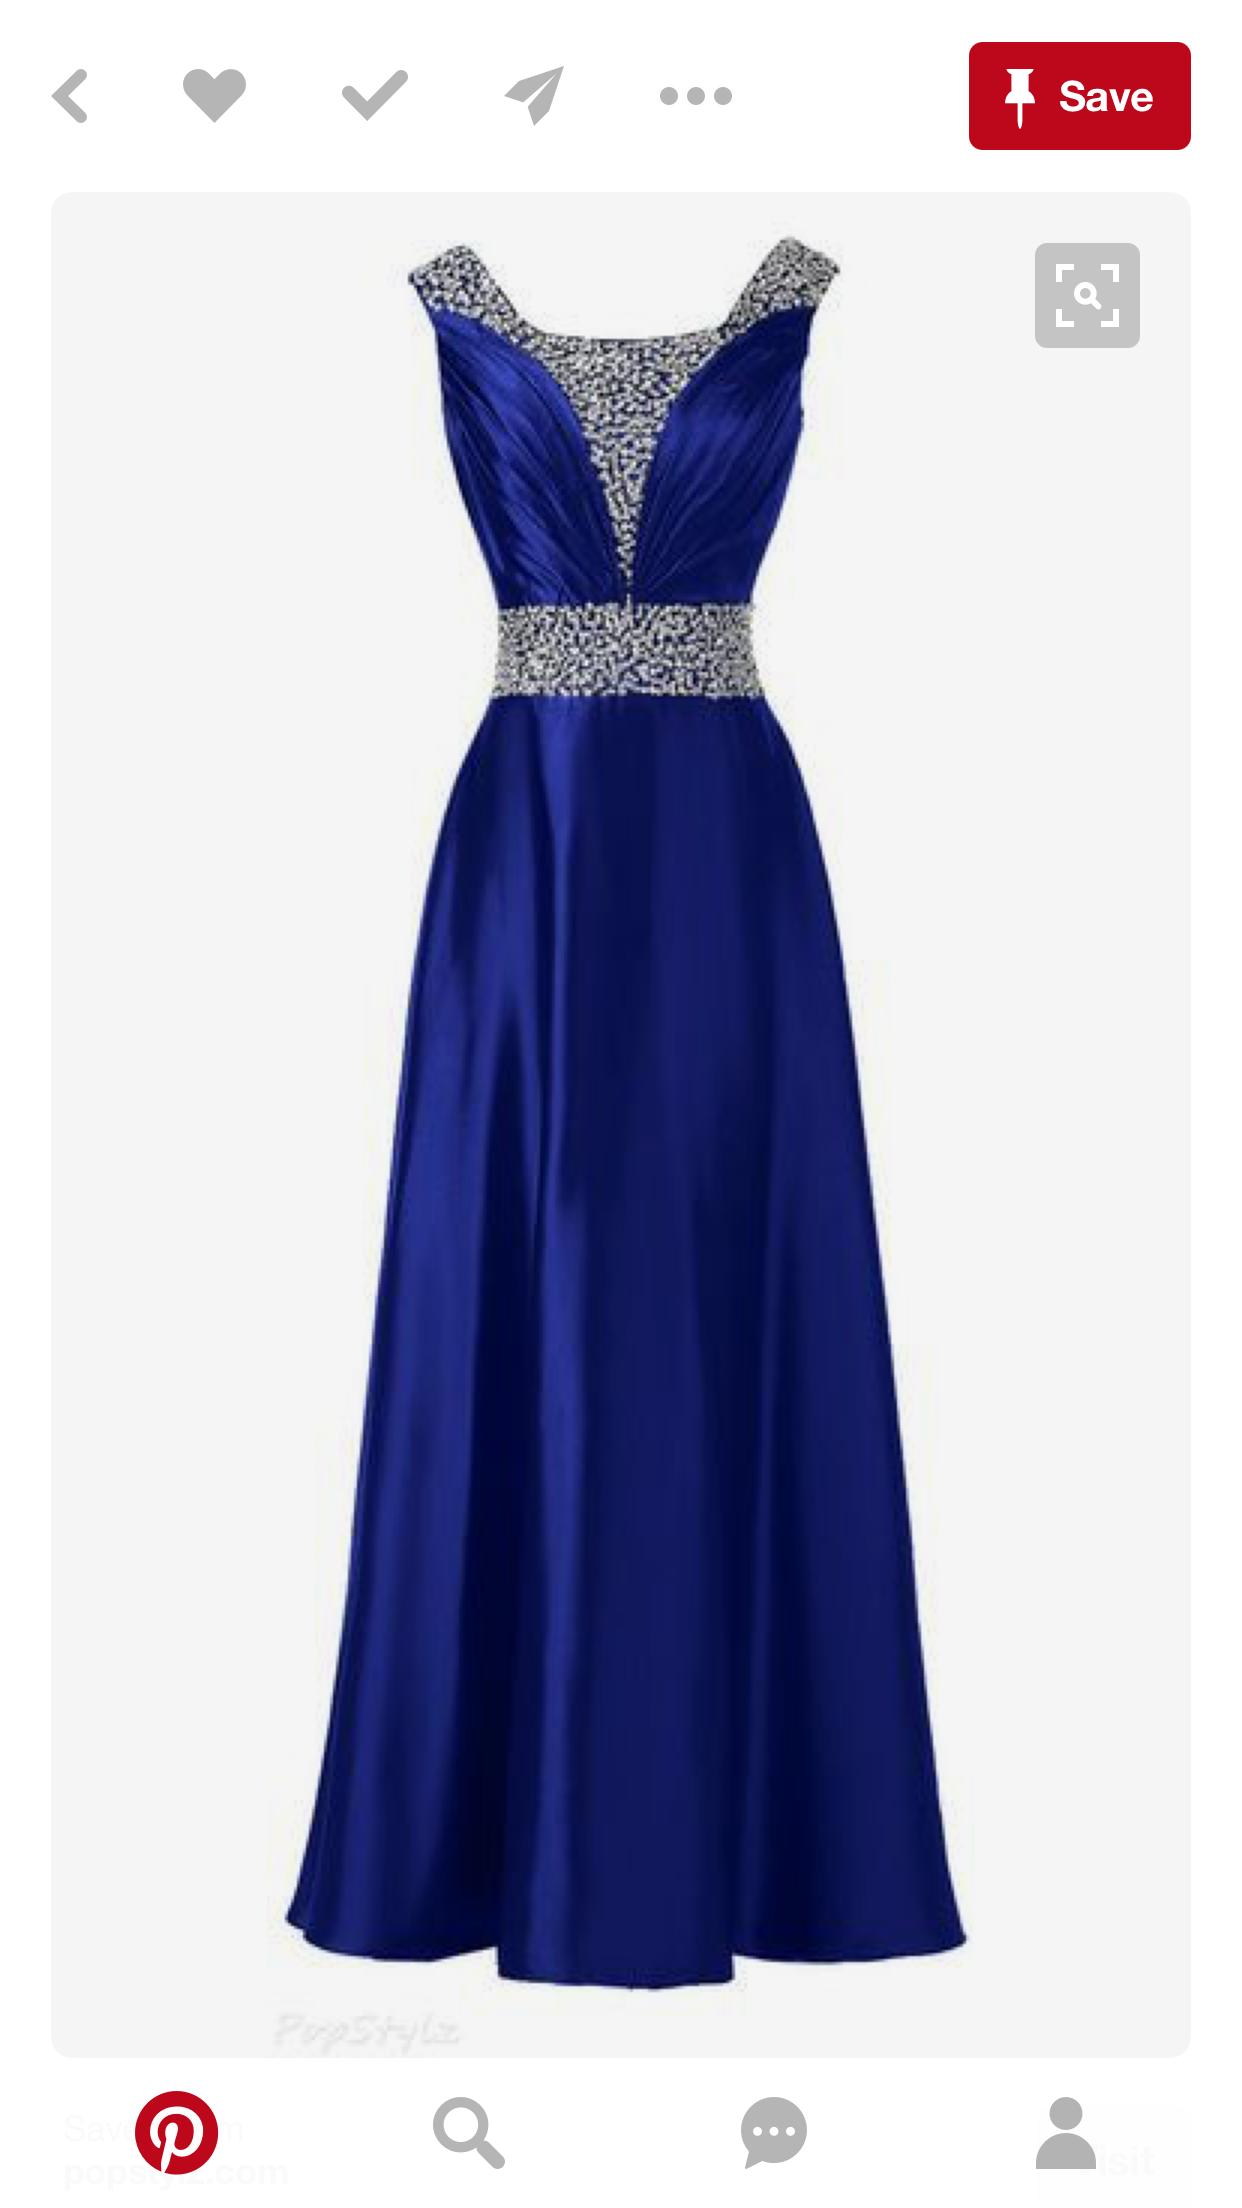 21c636c933f8 Prom Dresses Blue, Homecoming Dresses, Pretty Dresses, Strapless Dress  Formal, Wedding Dresses